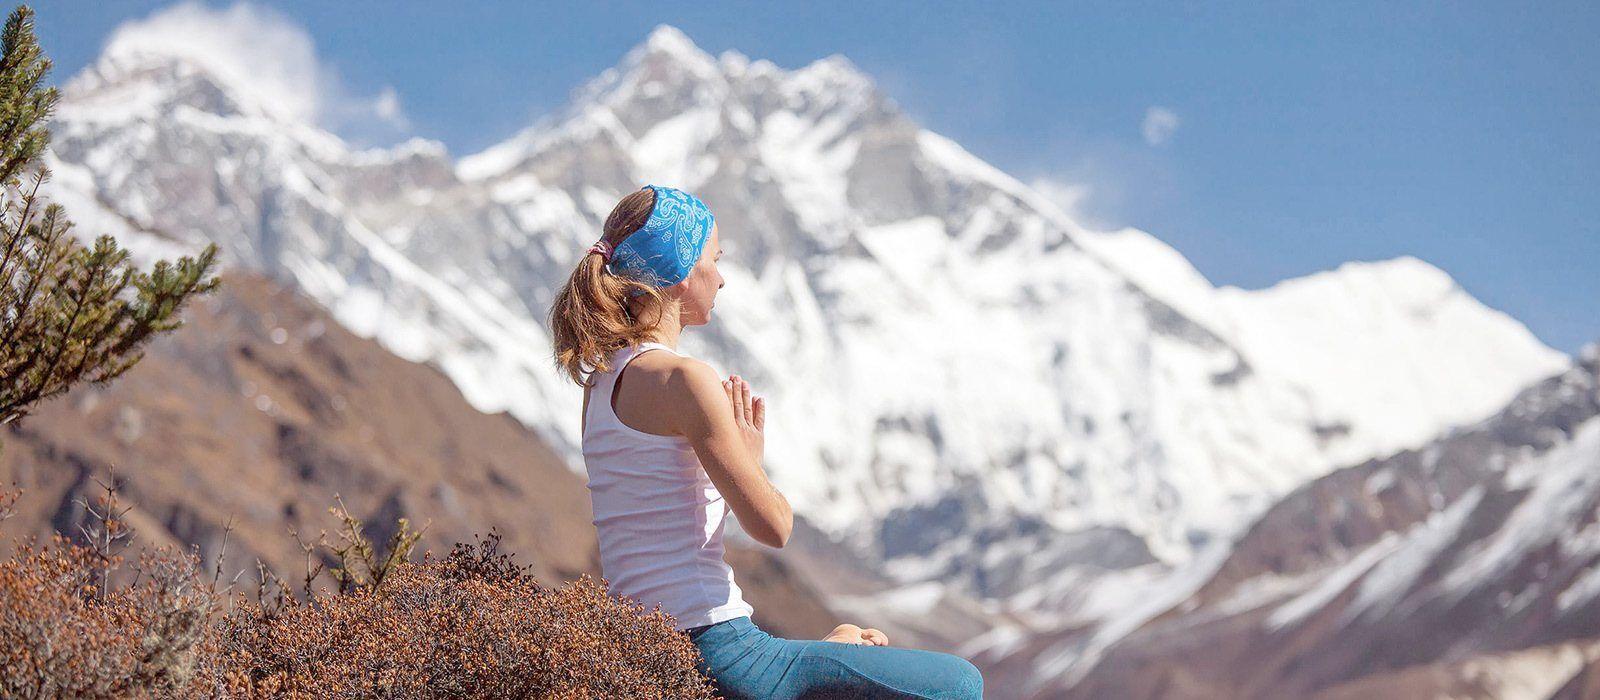 Ayurveda Reise – Harmonie im Himalaya Urlaub 1